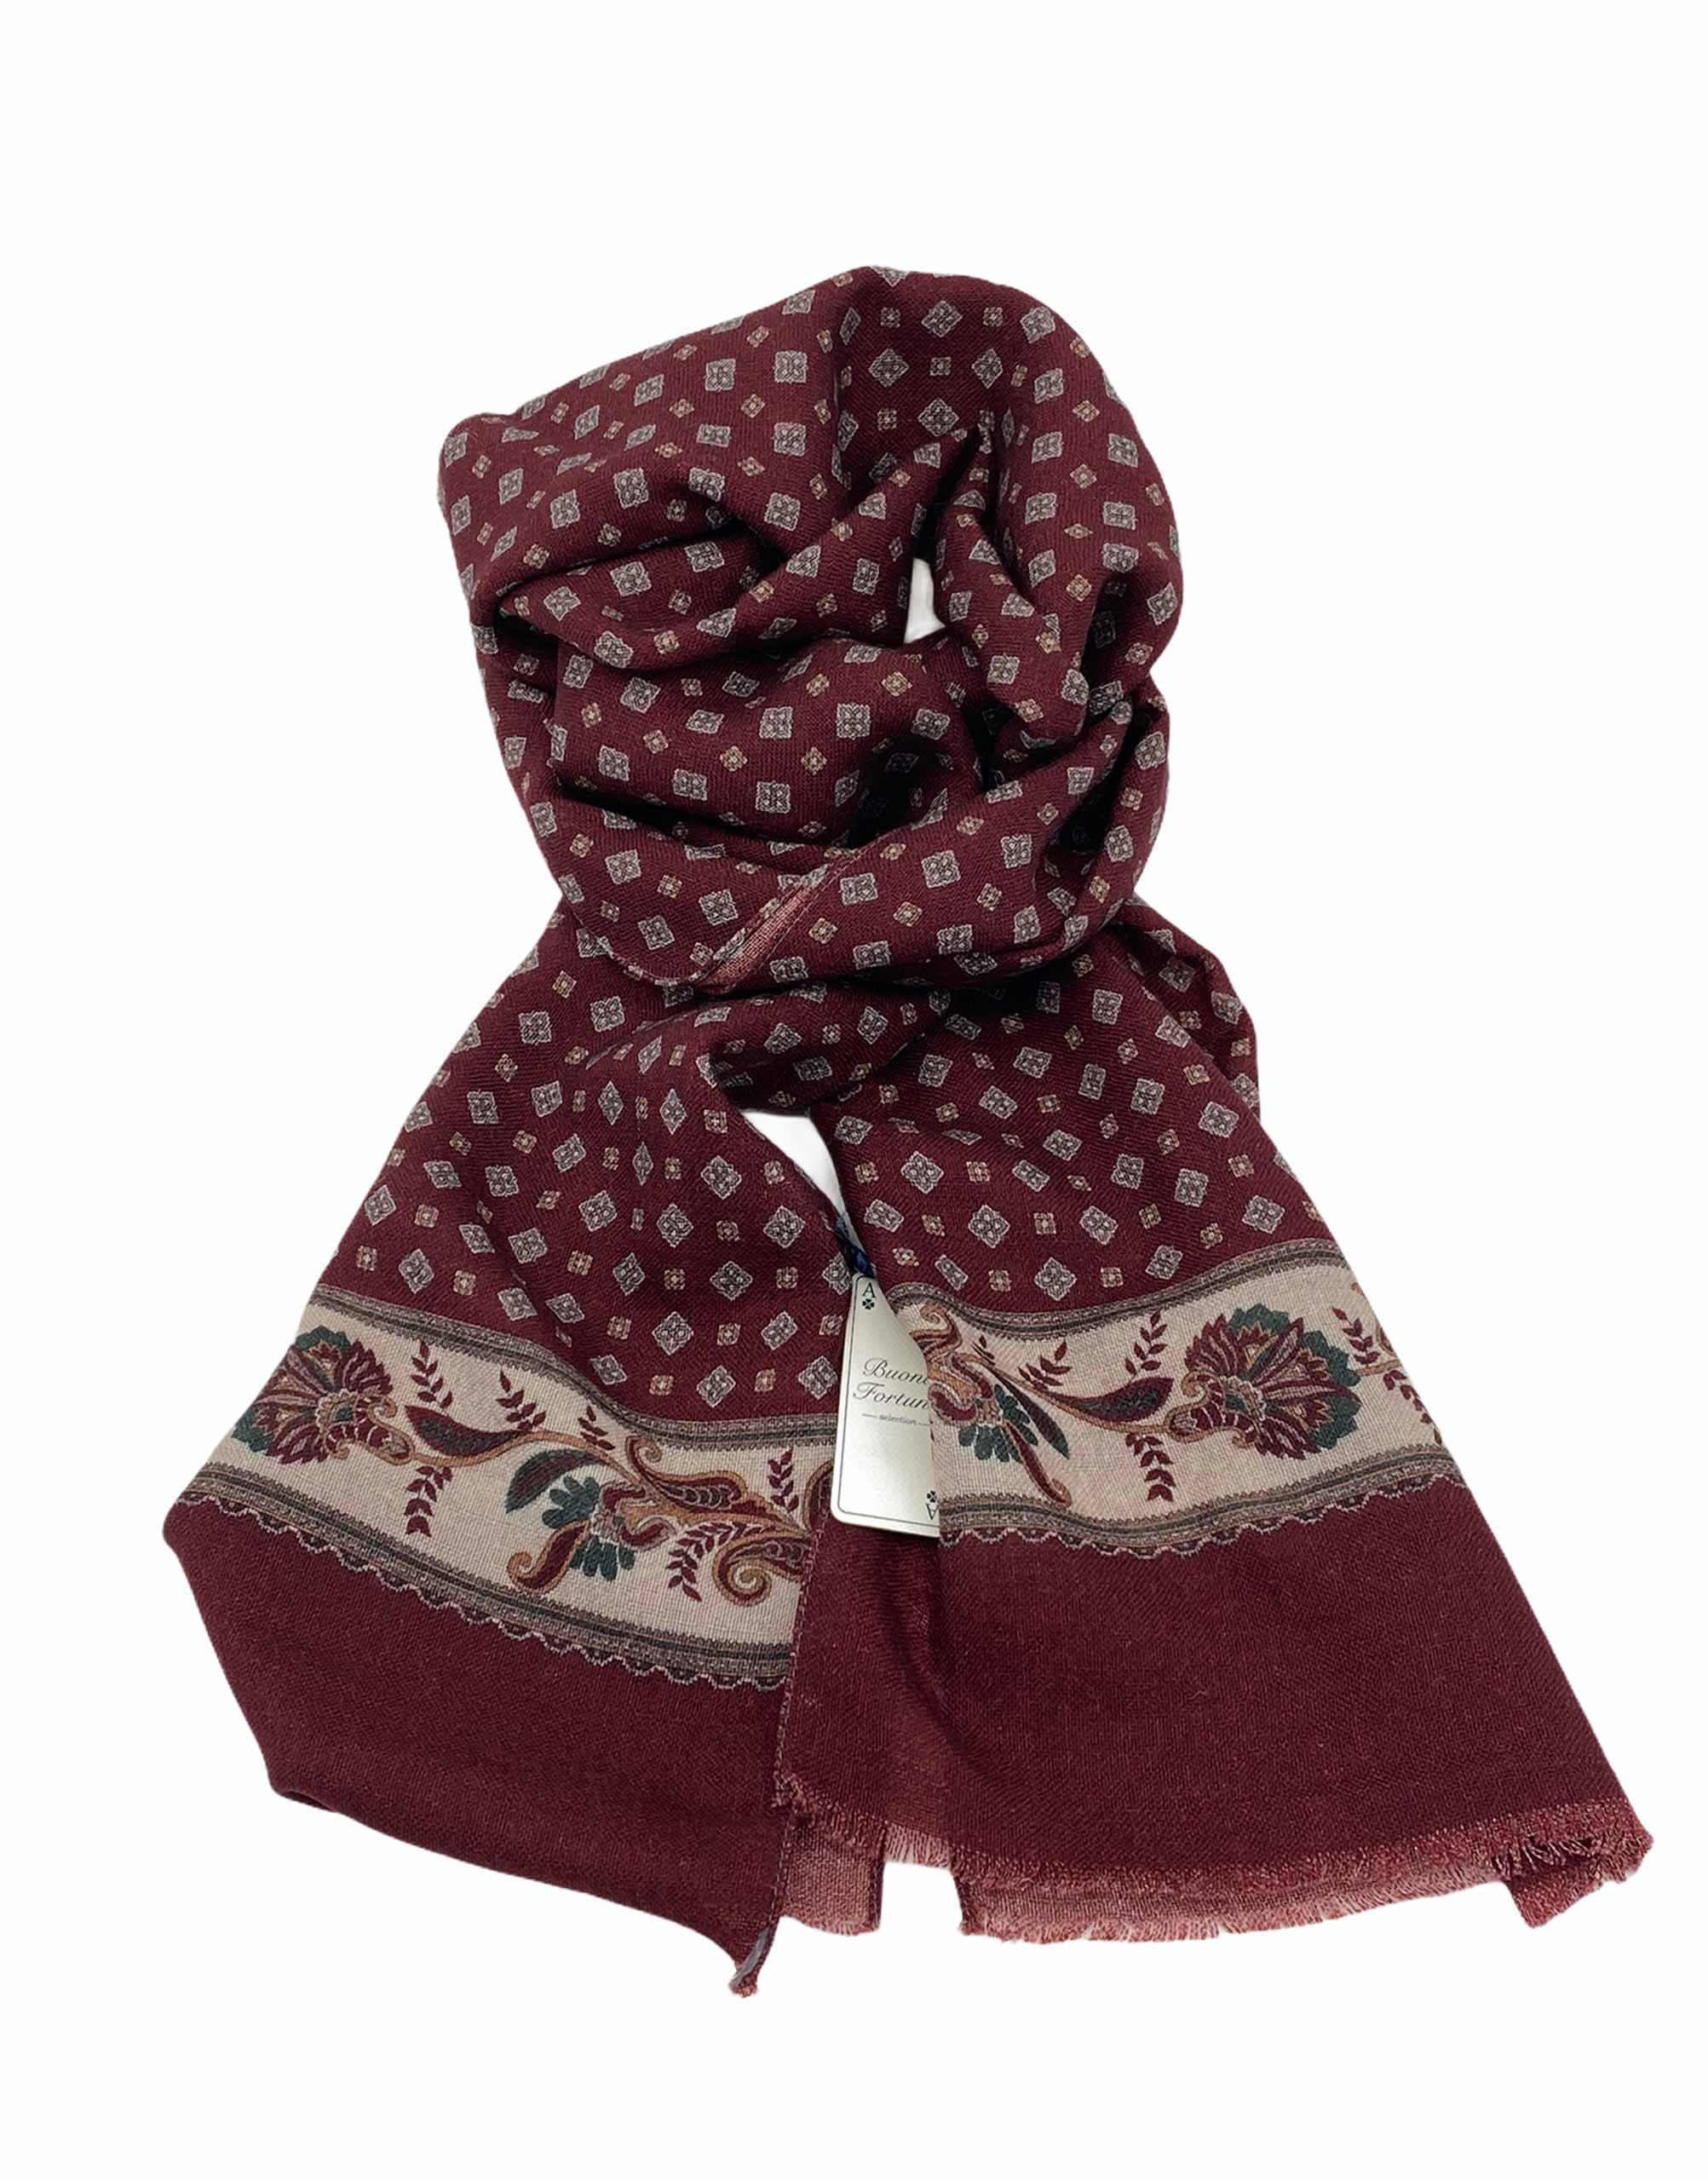 pashmina buona fortuna exclusivas comprar online moda italiana foulards shop cenefa flores granate